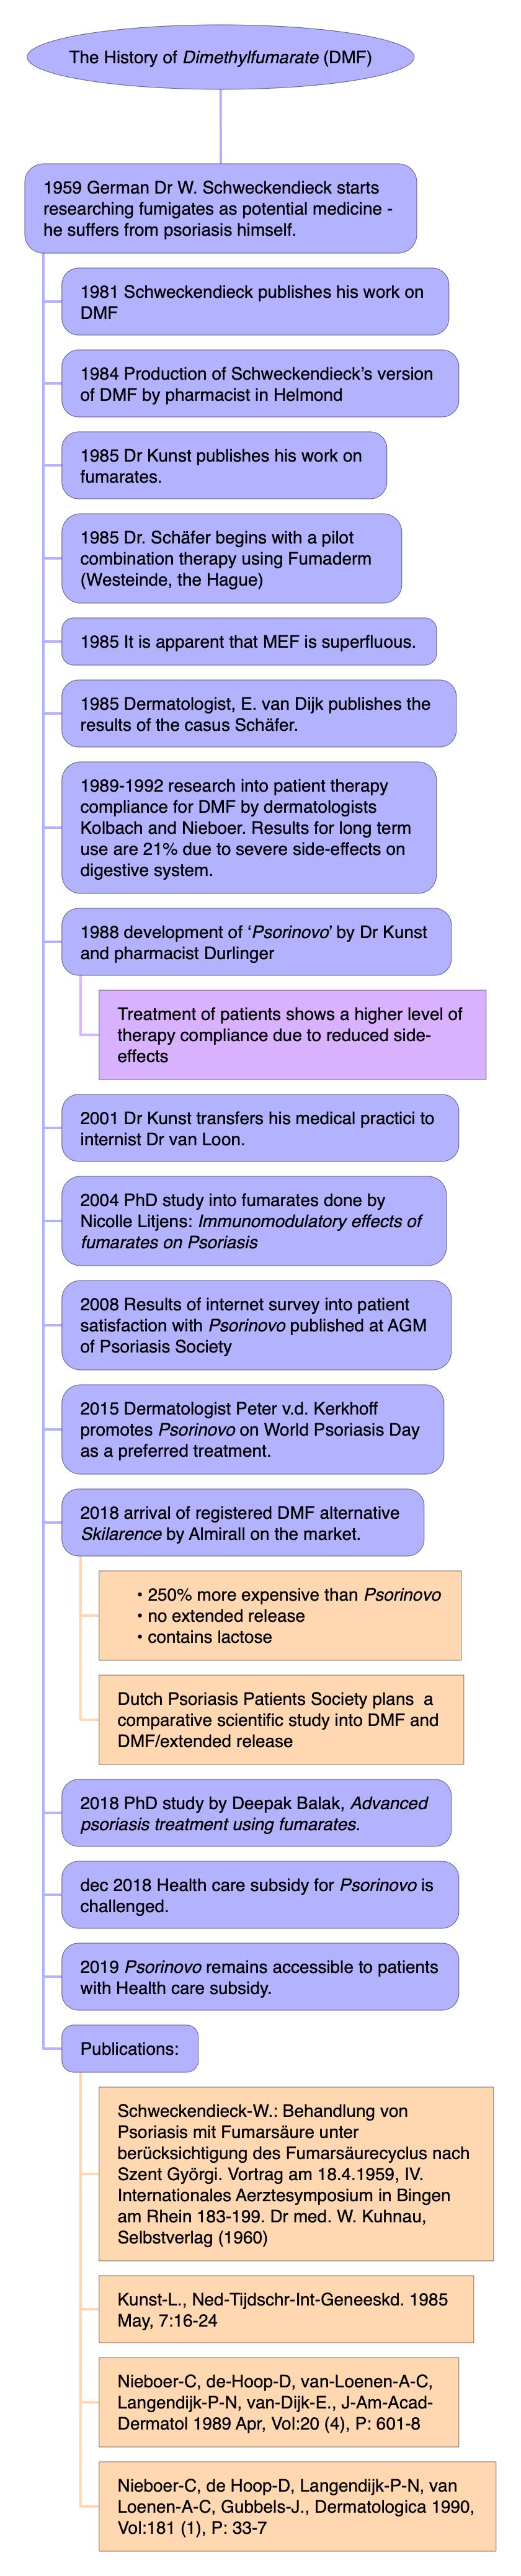 Art of Medicure - Articles